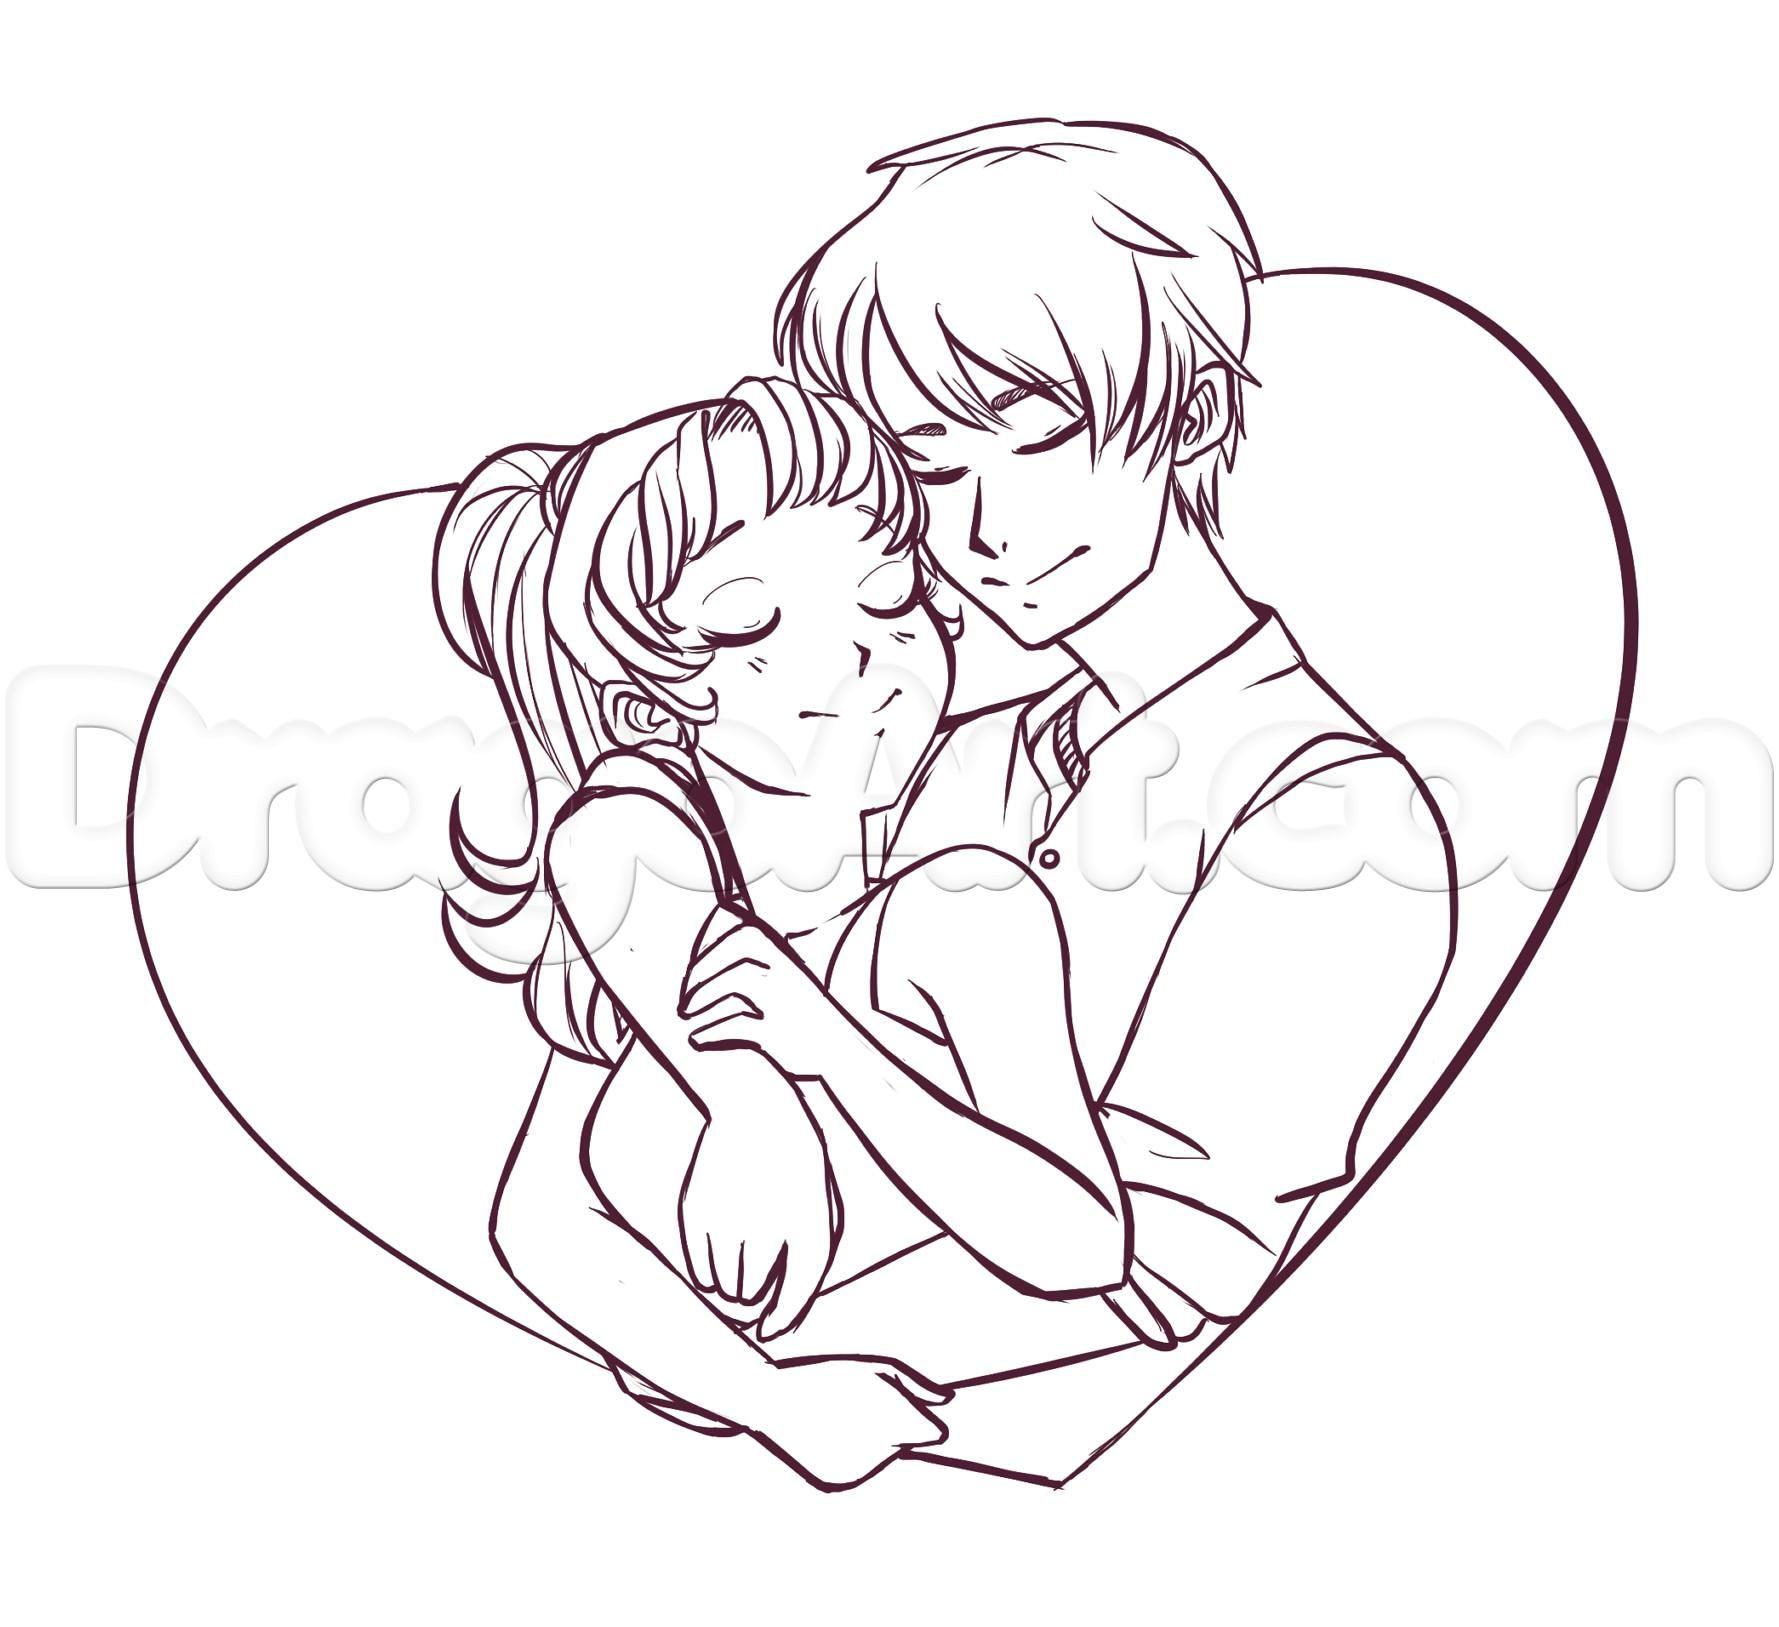 Cute Couple Cartoon Couples Drawings Couple Drawings Hugging Drawing